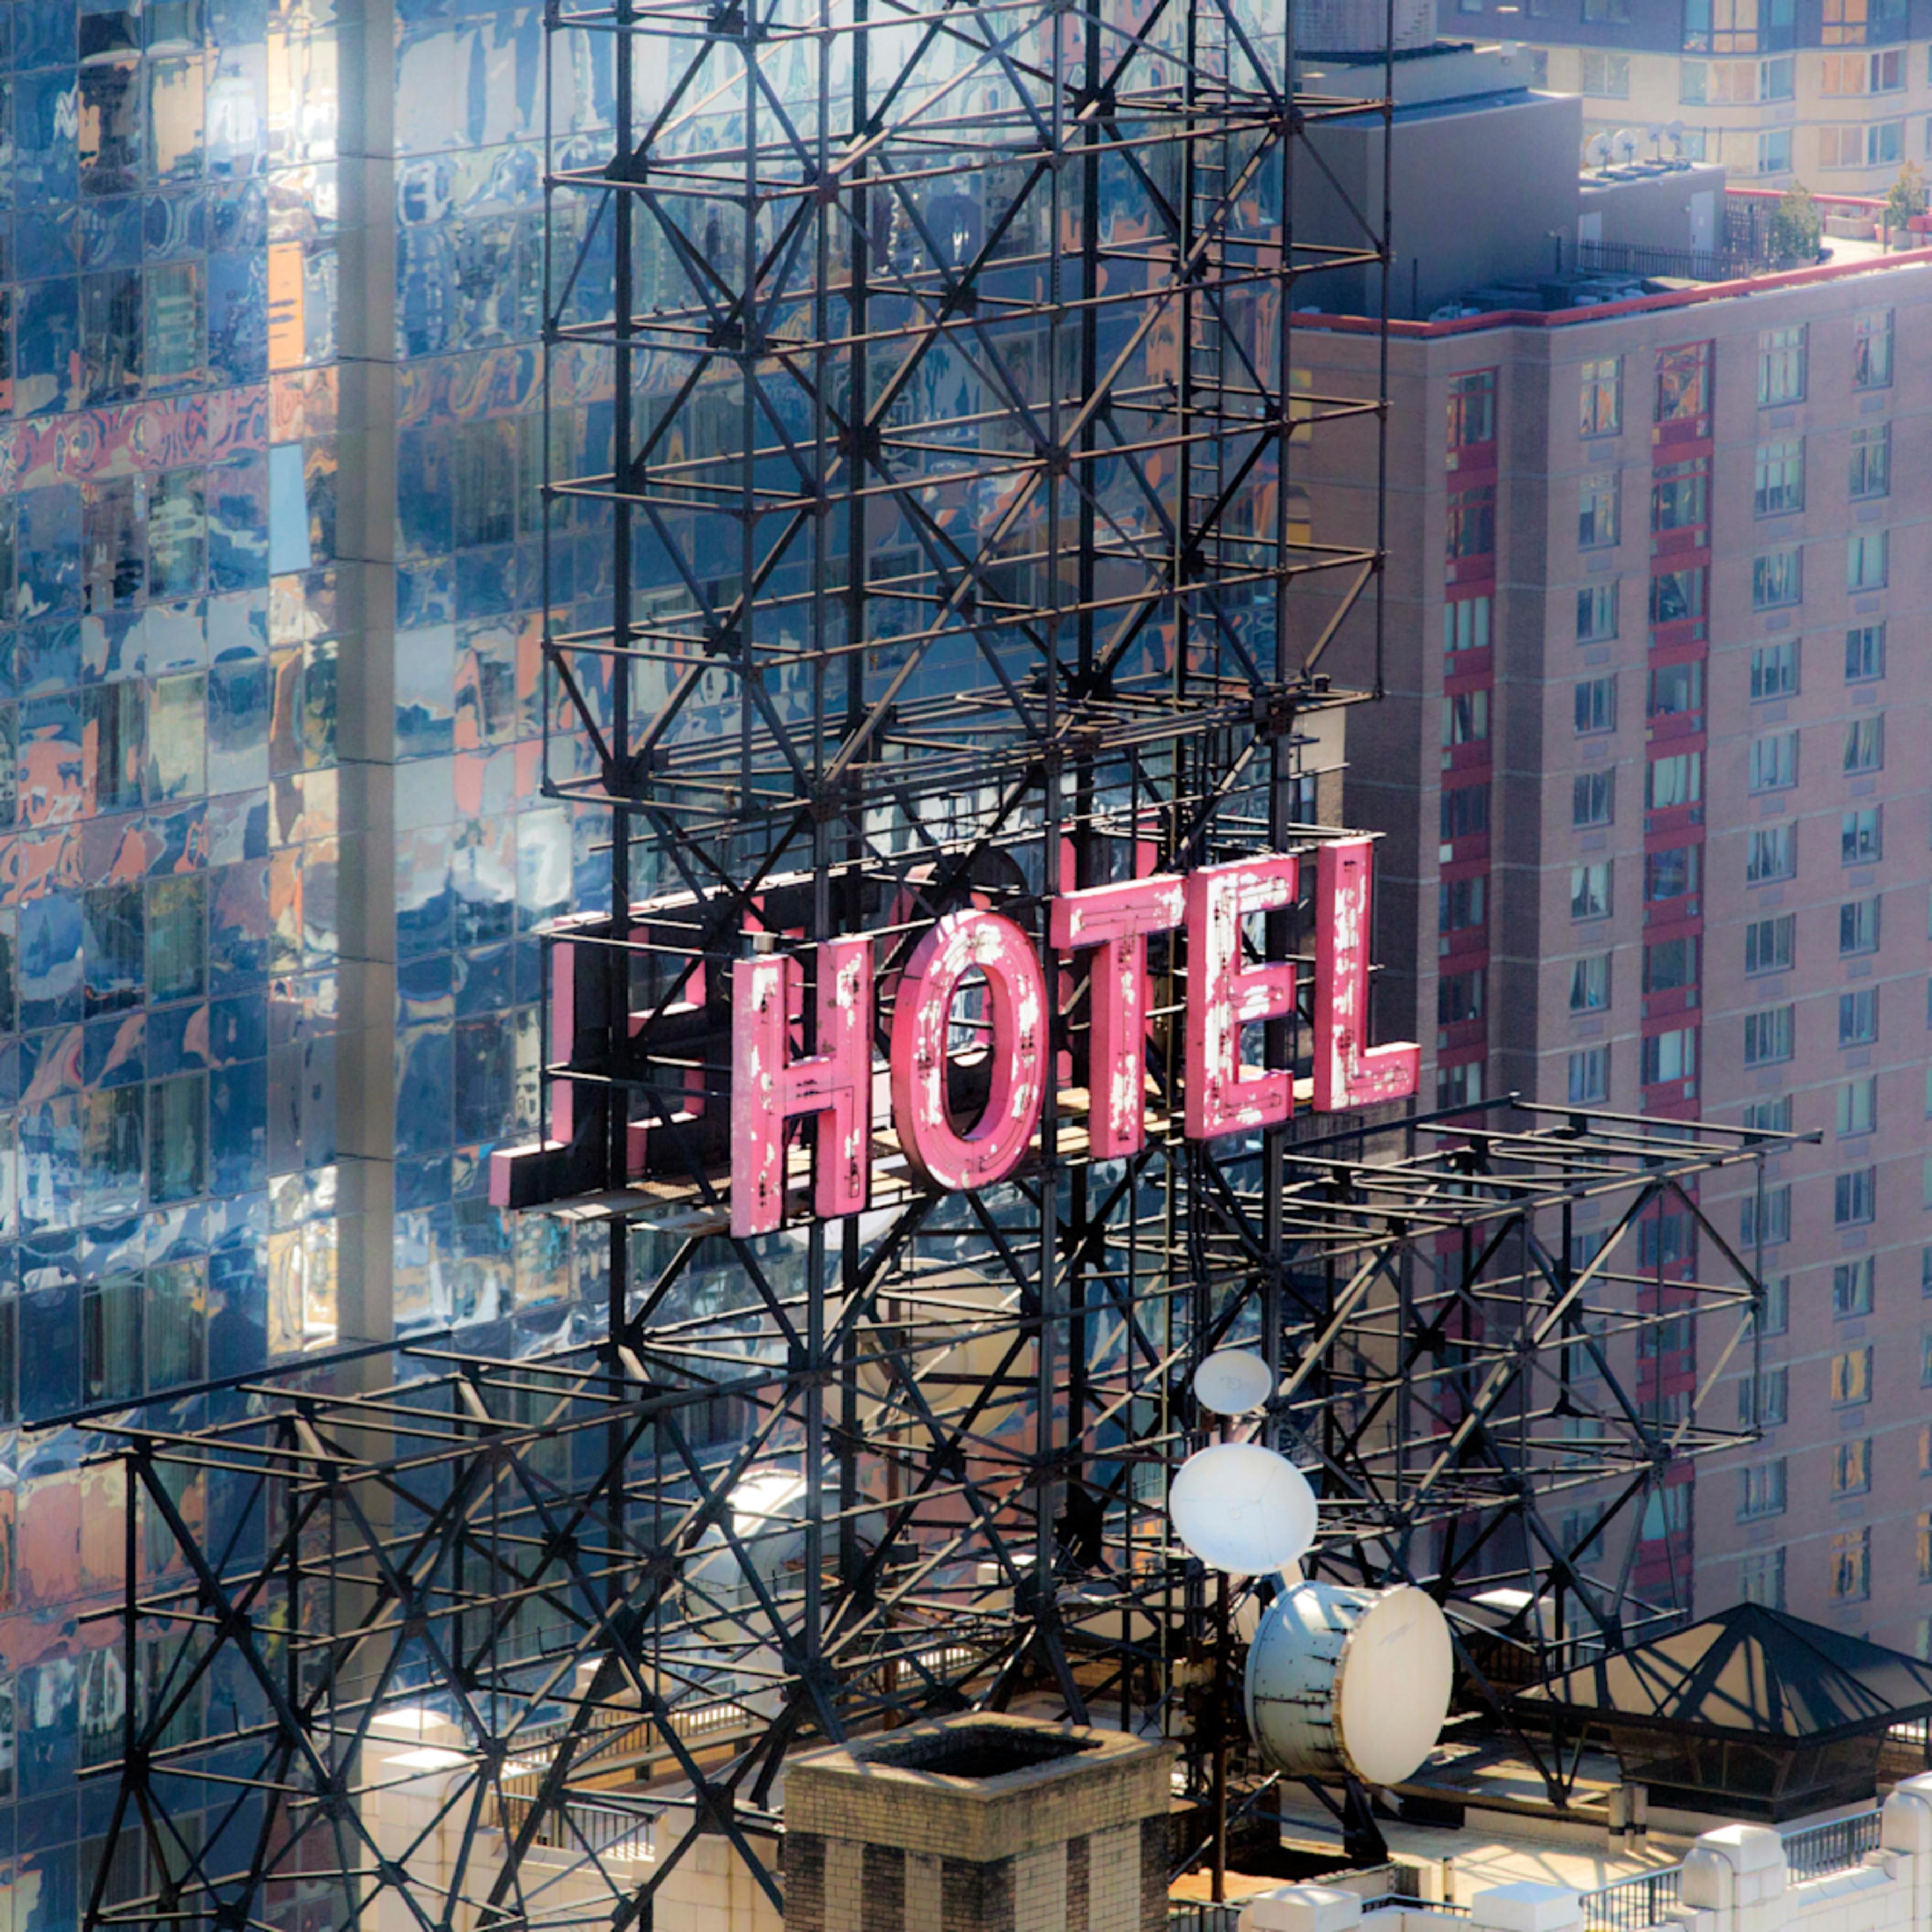 Goldman hotel 2463 hrv1 z8ys3e